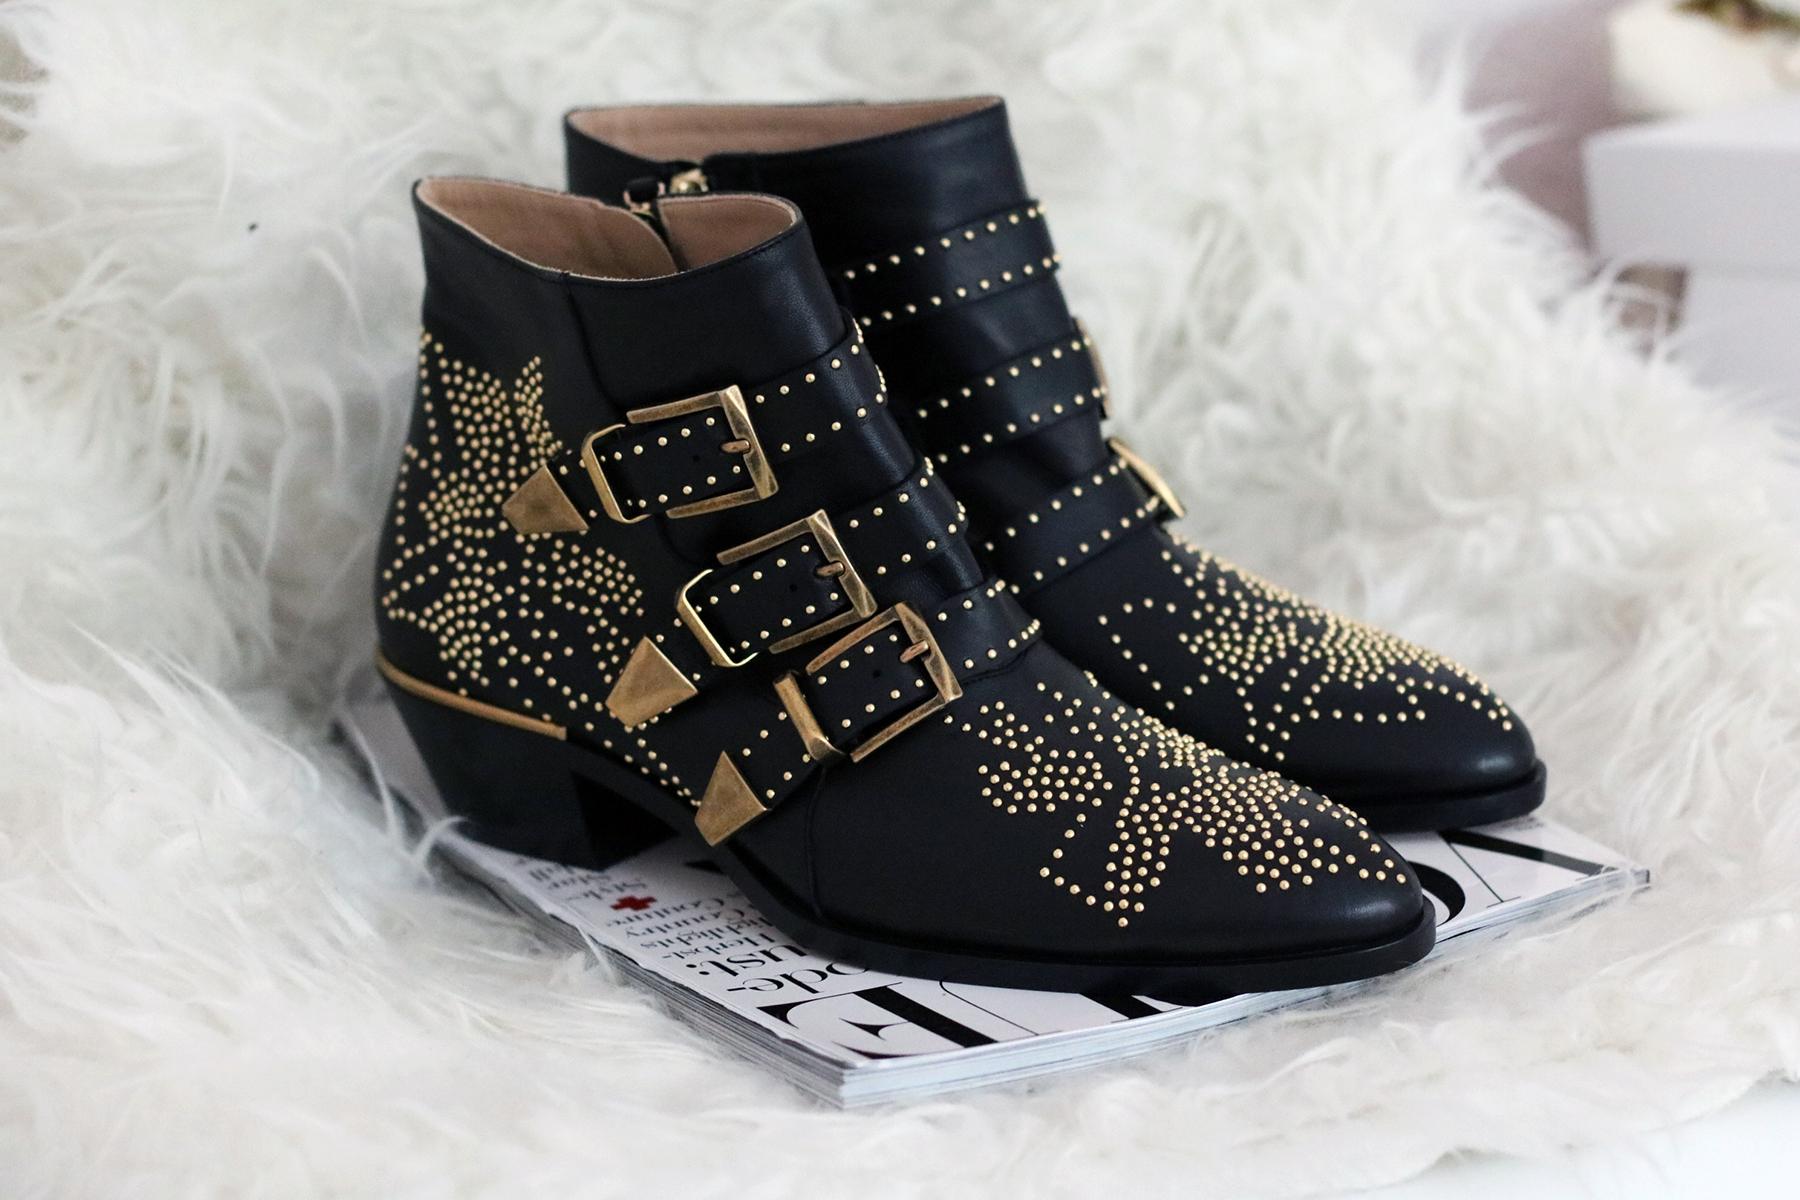 collonil-schuhe-boots-herbst-winter-liebste-modeblog-pflege10-chloe-susanna2